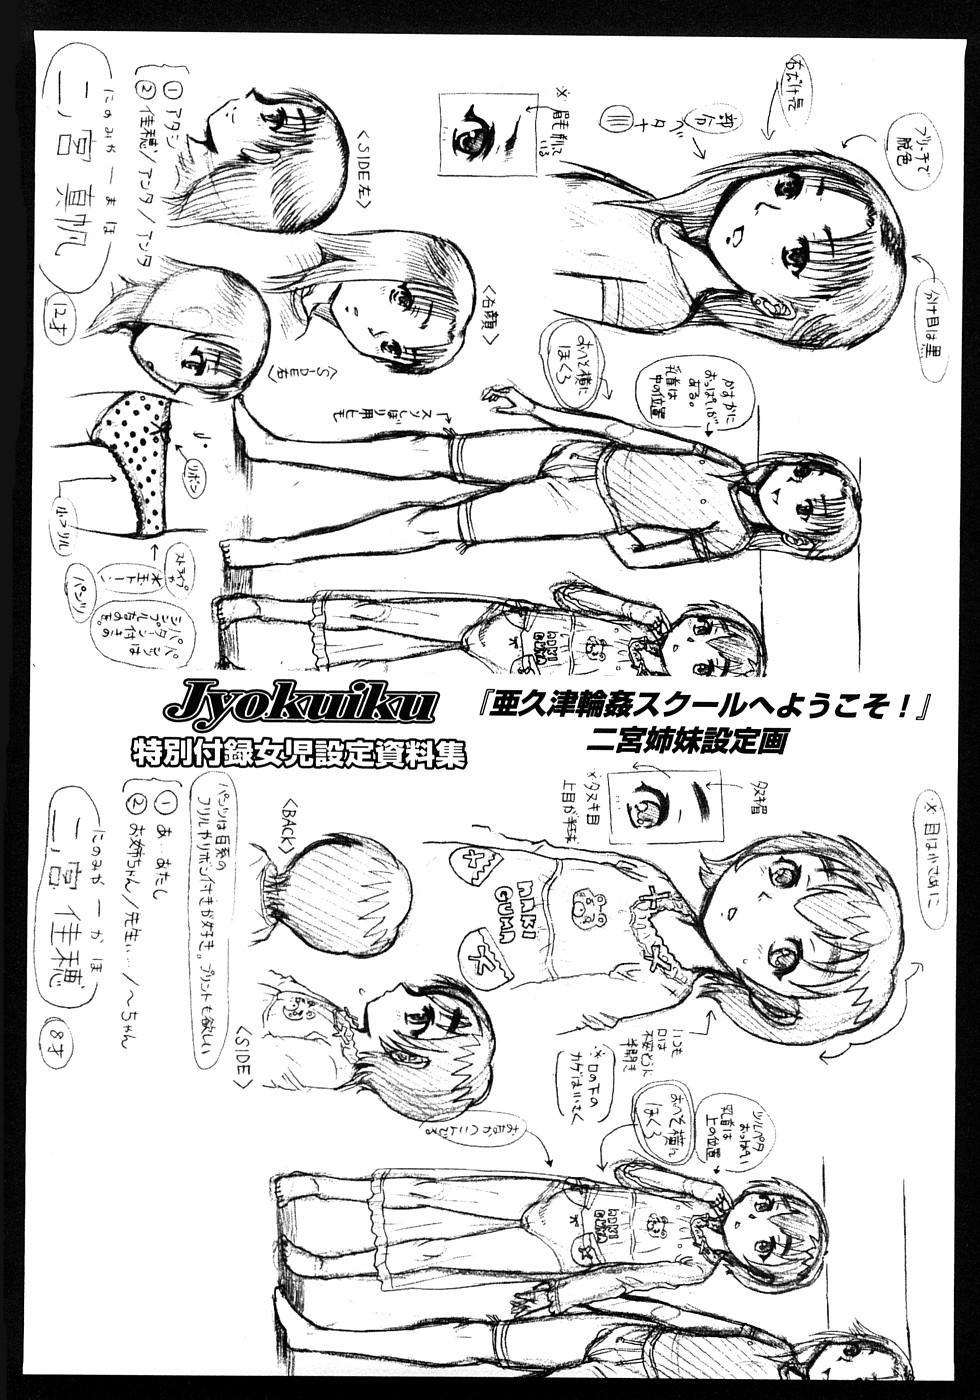 Jyokuiku 192